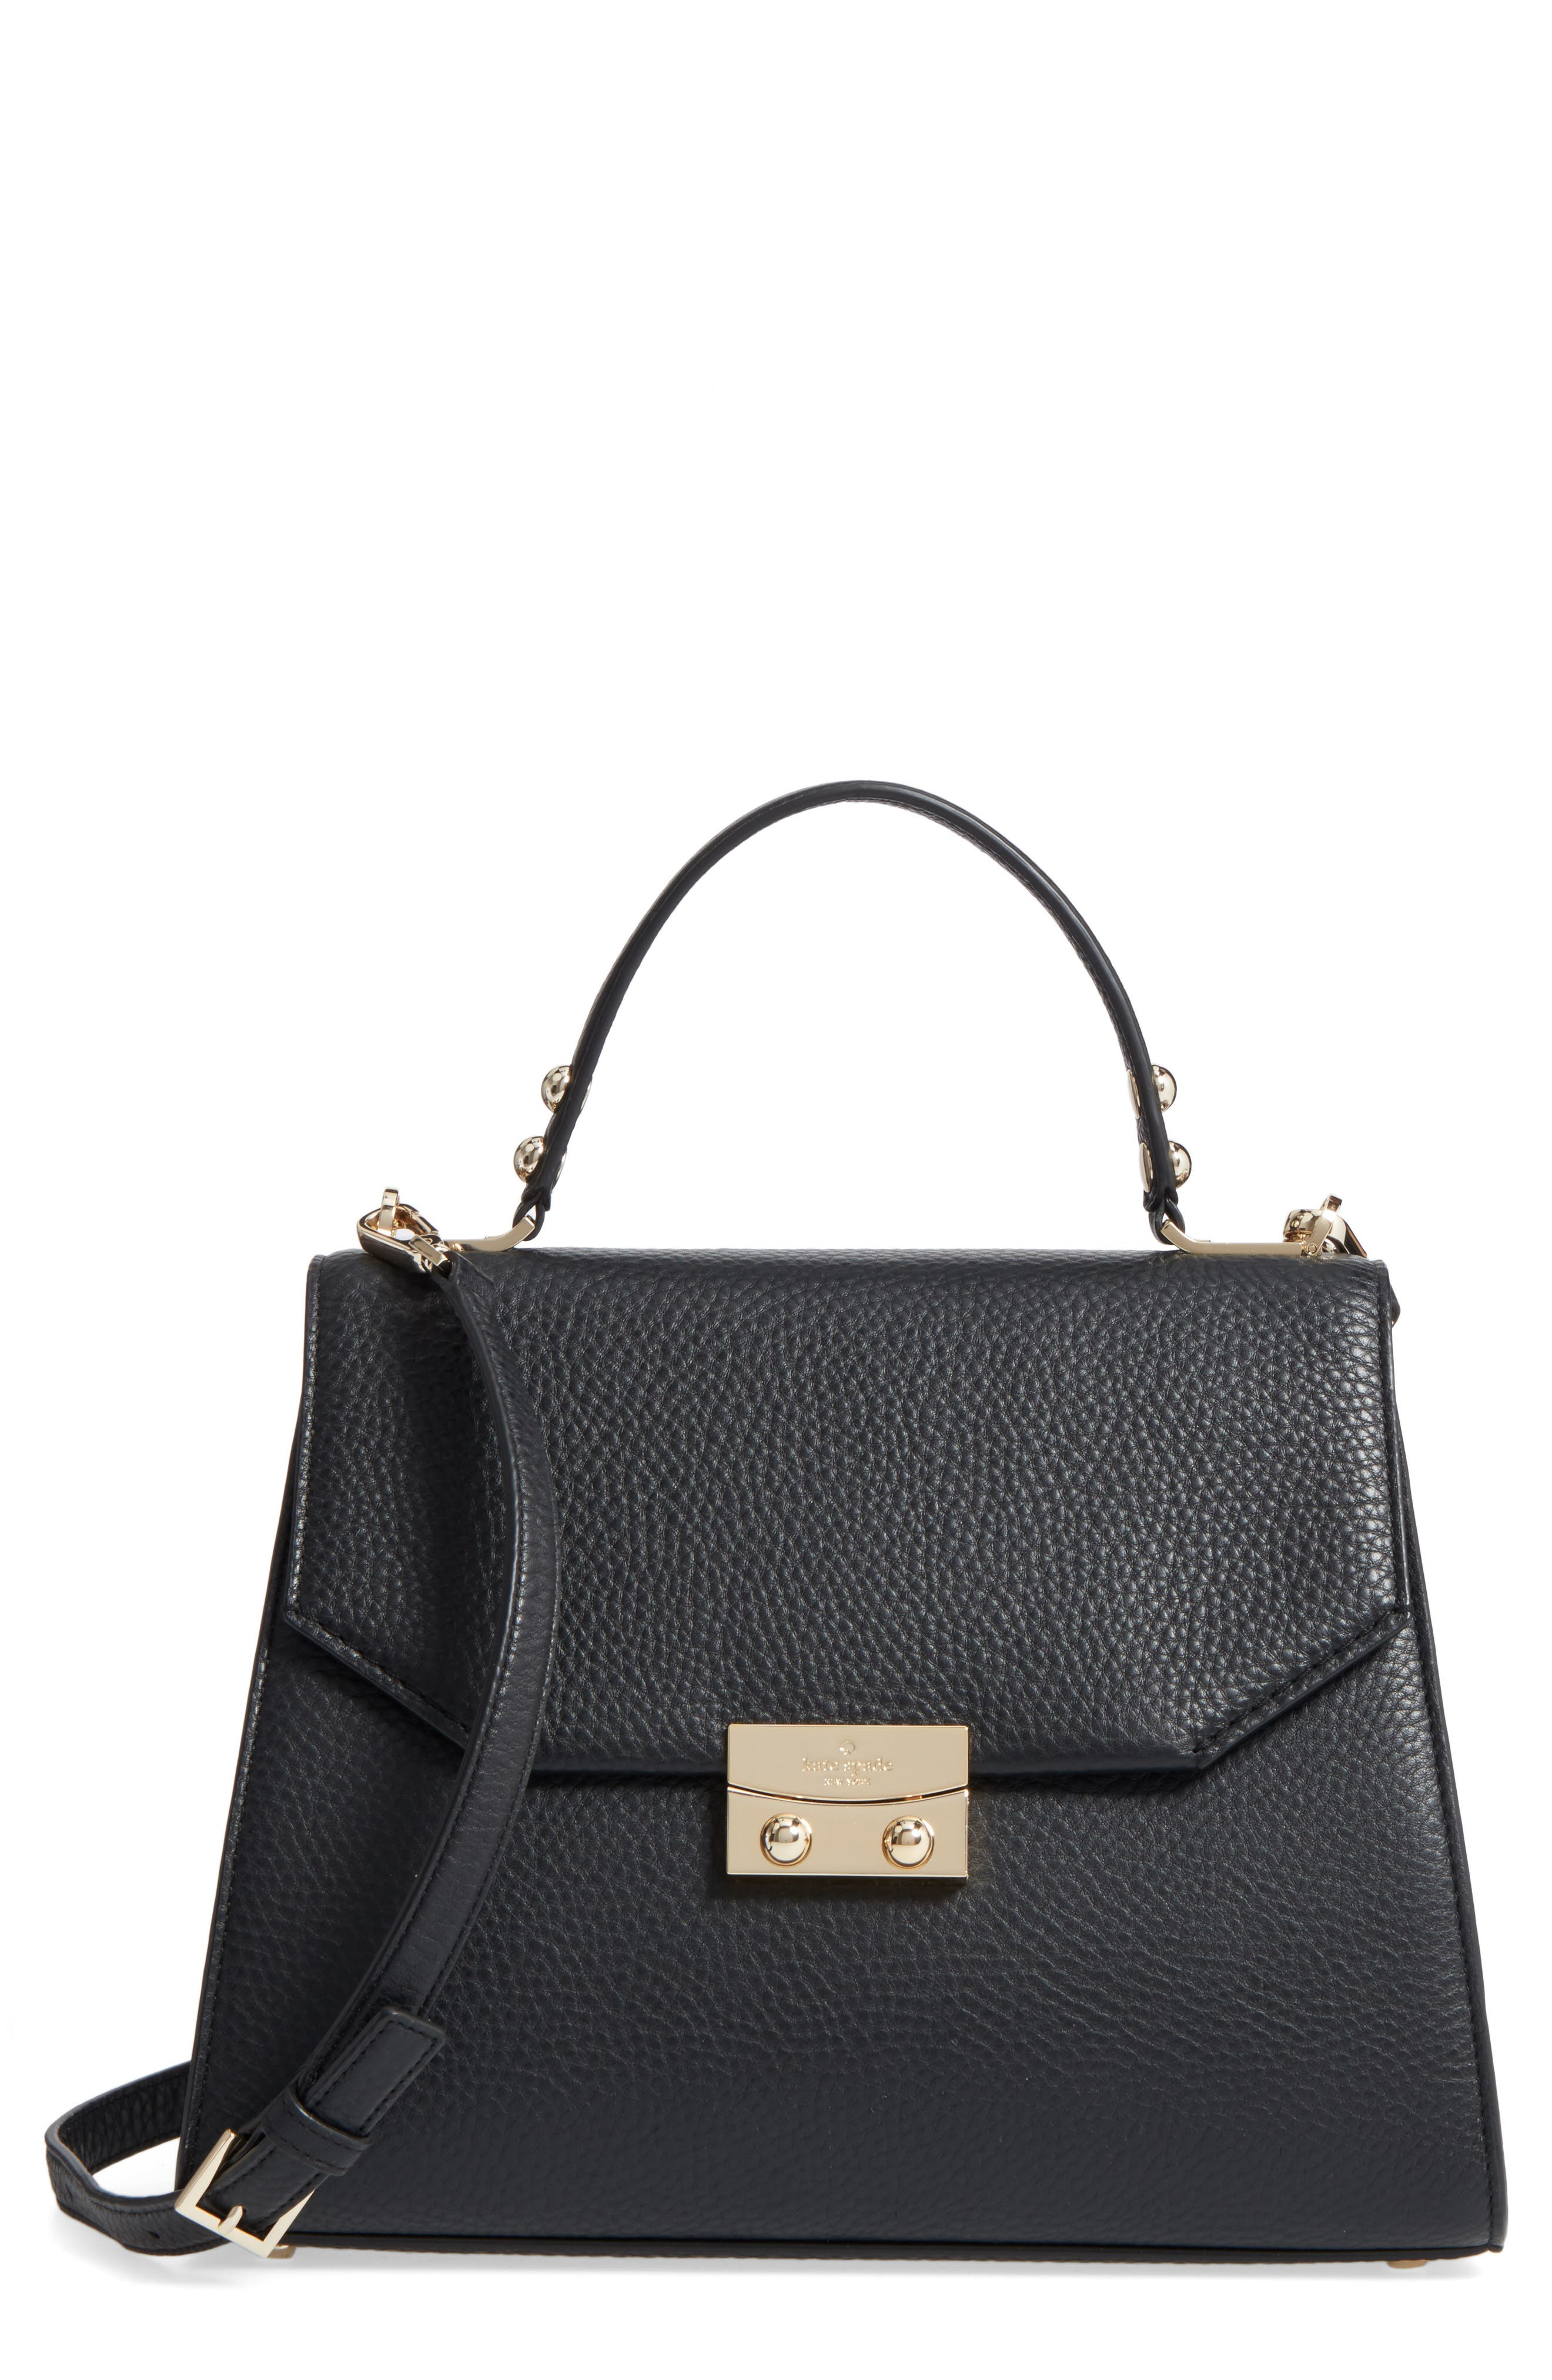 kate spade new york stewart street samira leather top handle satchel